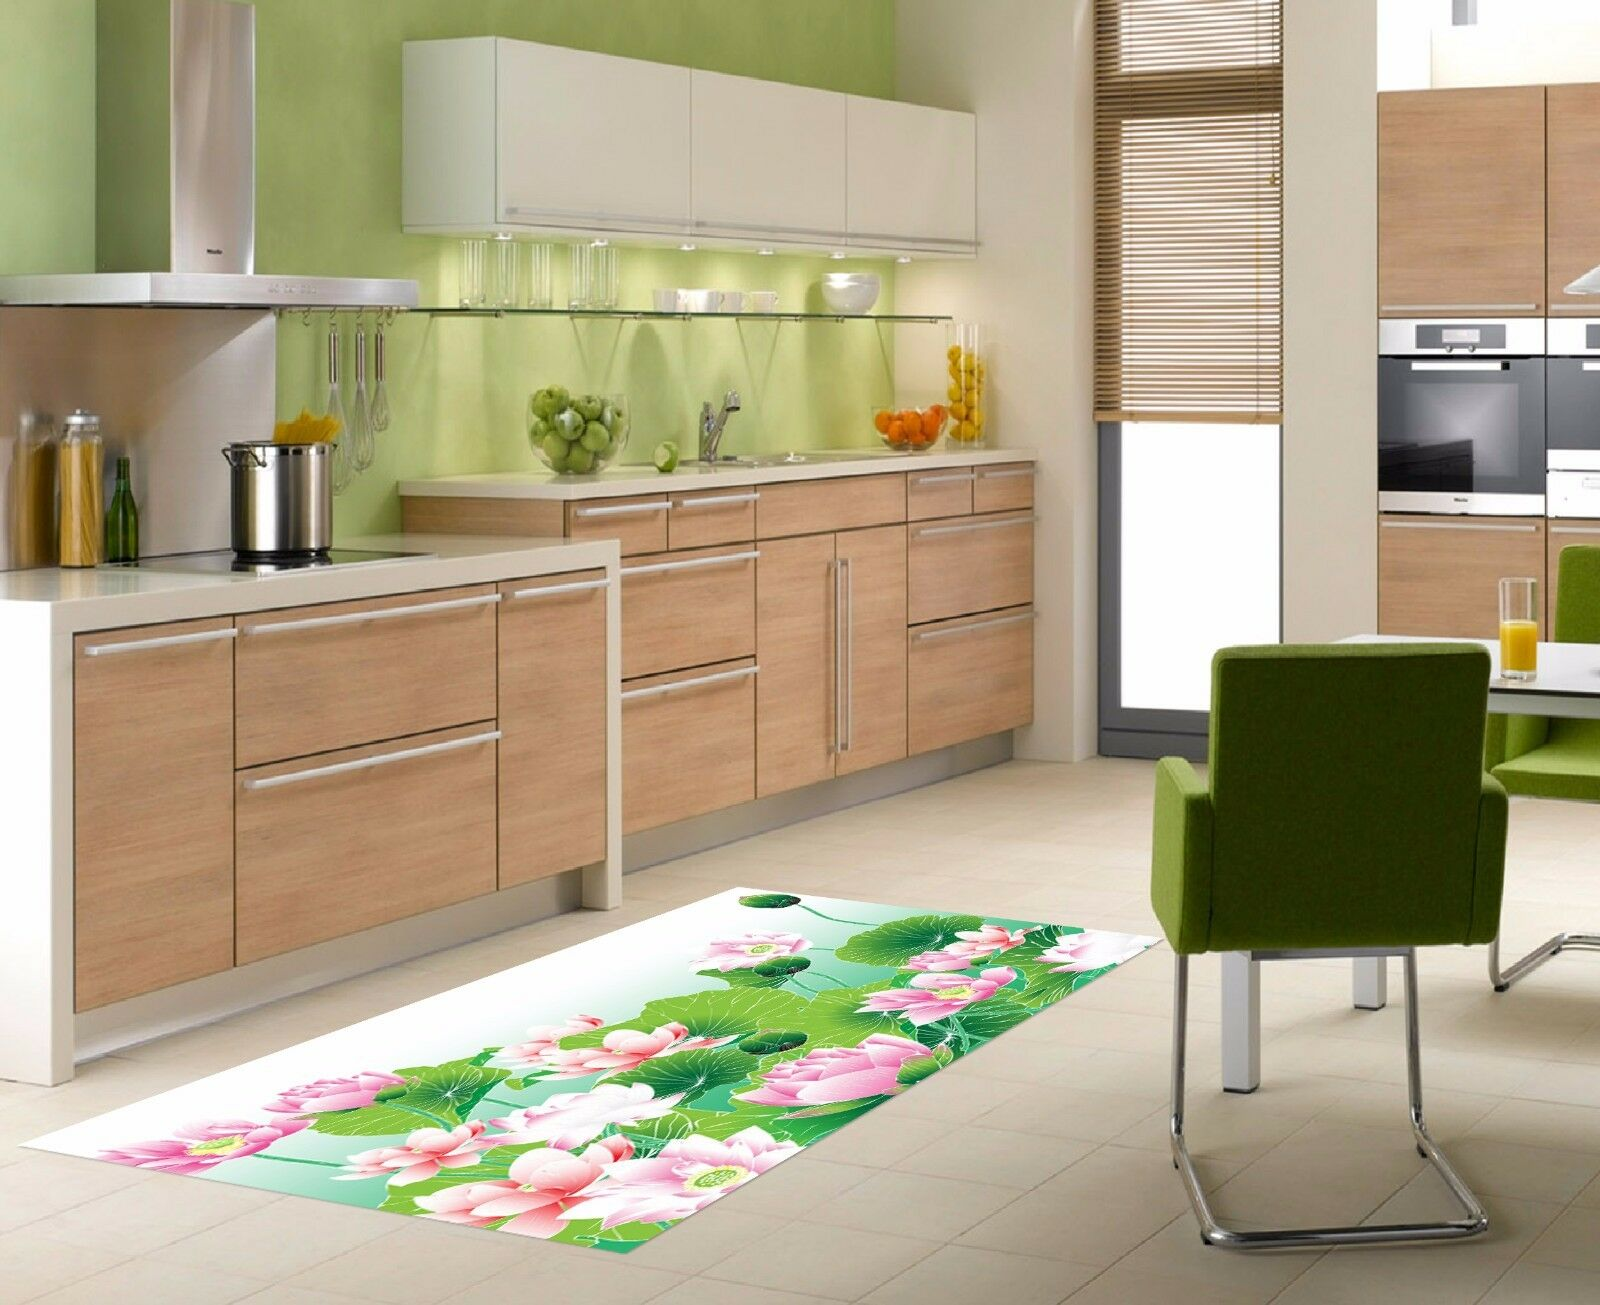 3D Lotus Flower 7 Kitchen Mat Floor Murals Wall Print Wall AJ WALLPAPER AU Carly